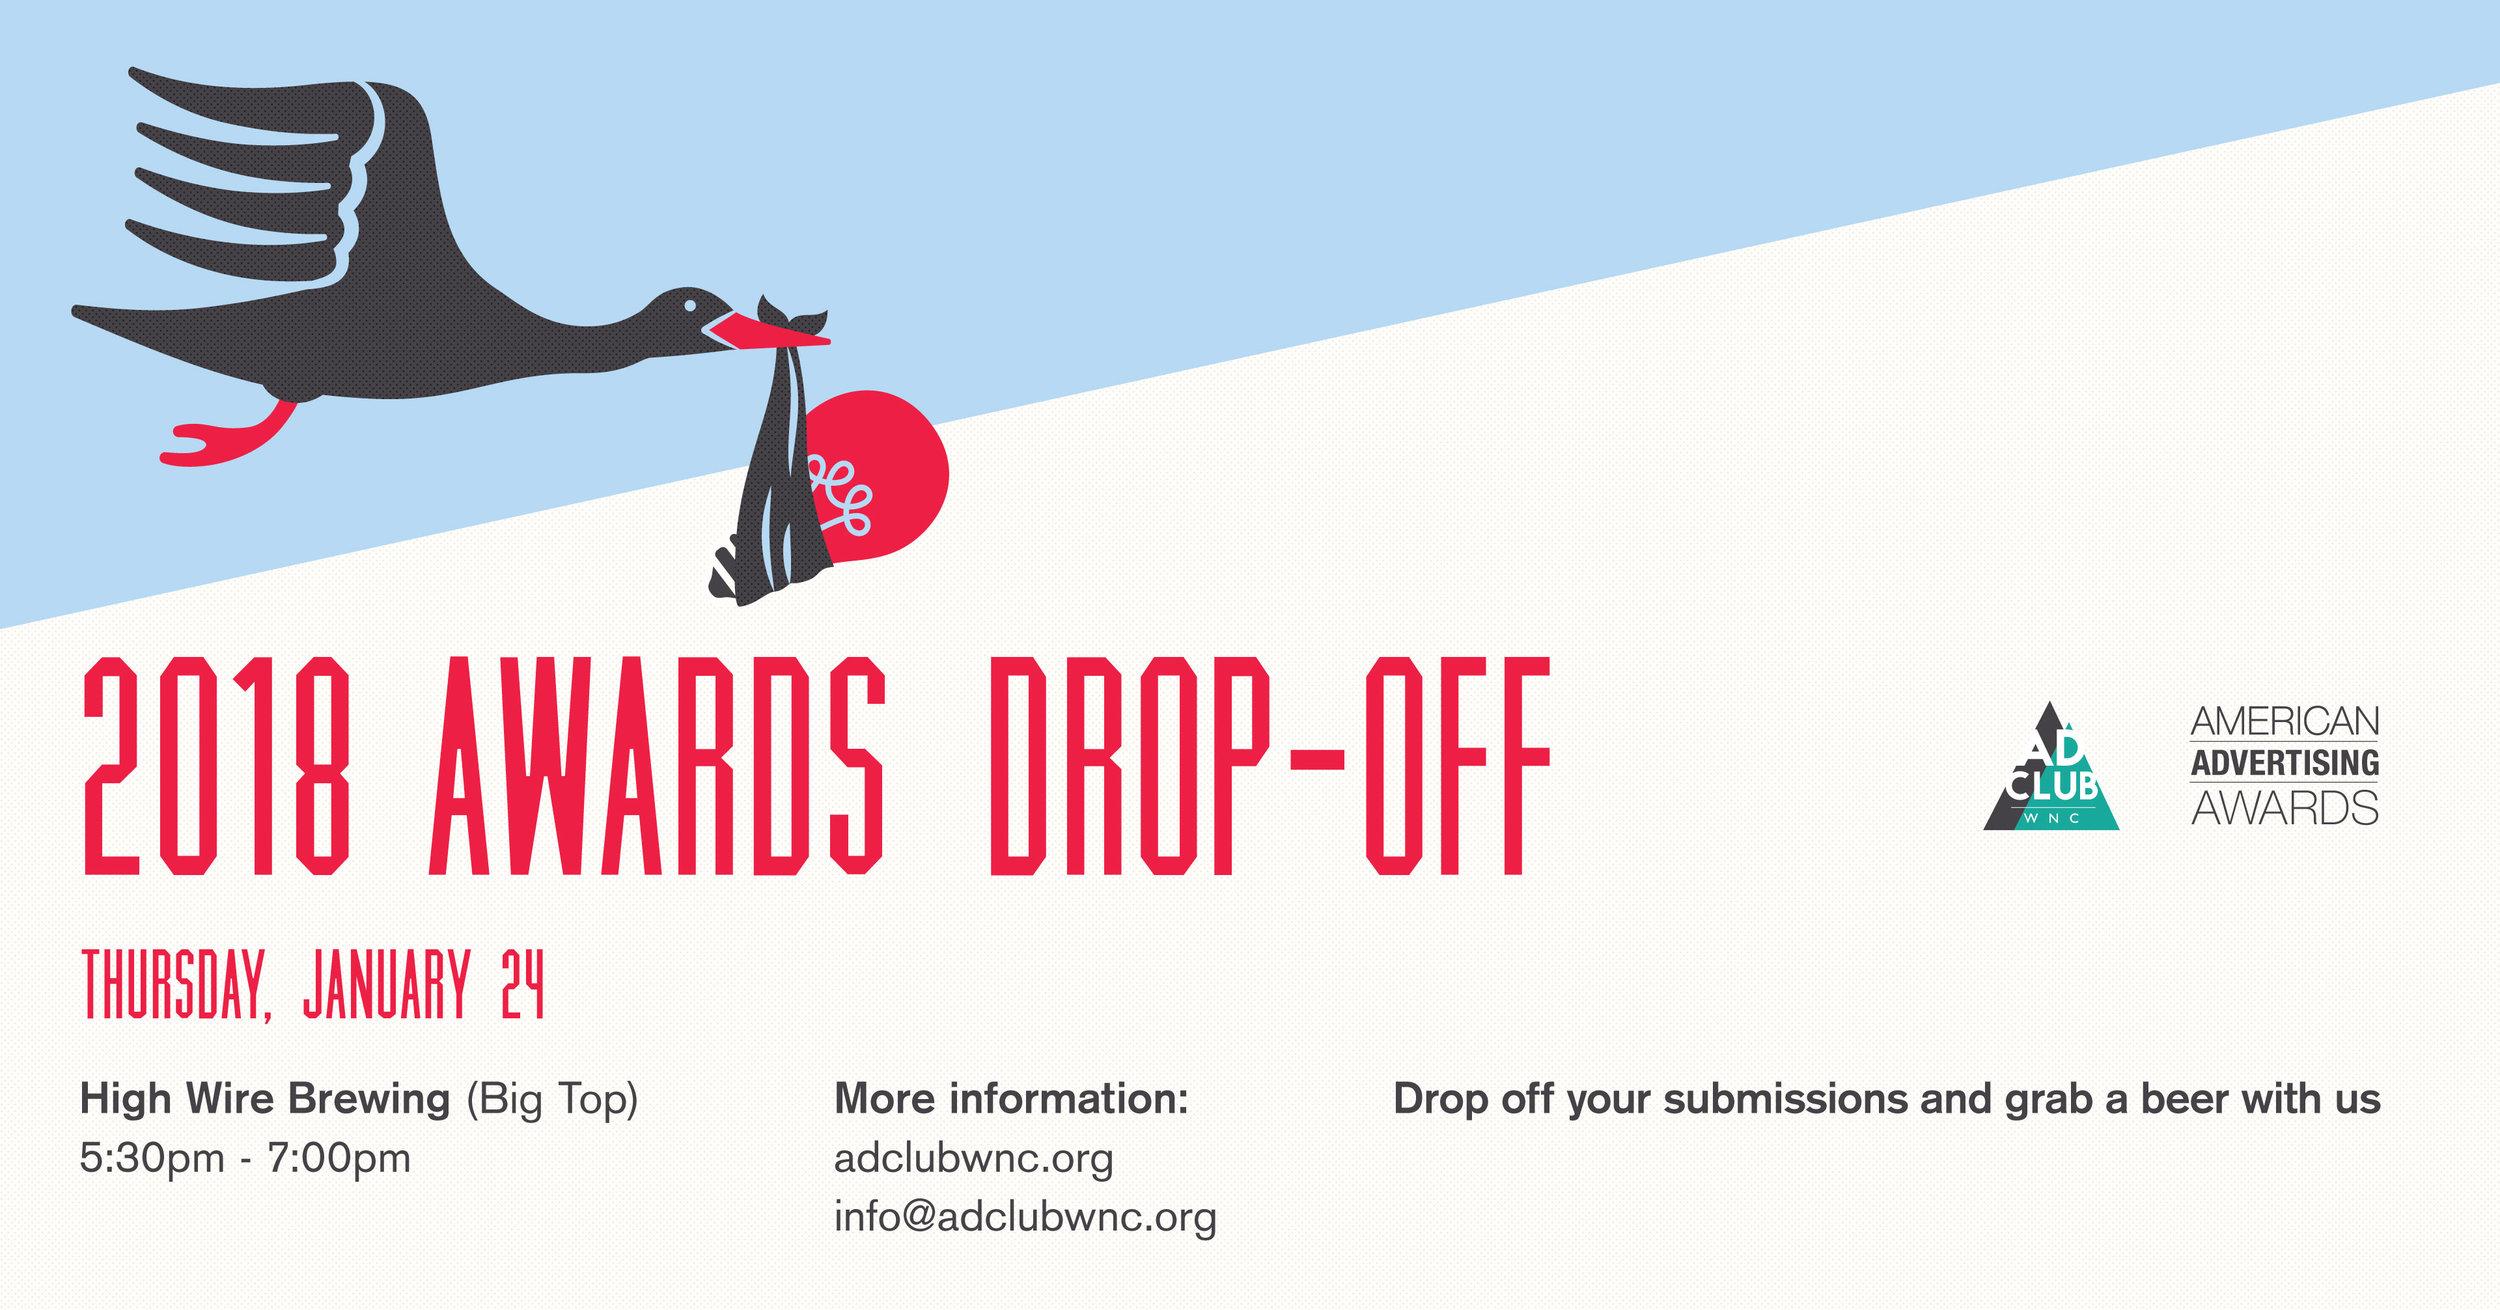 AdClub_2018_Awards_Drop-Off_FB_event.jpg